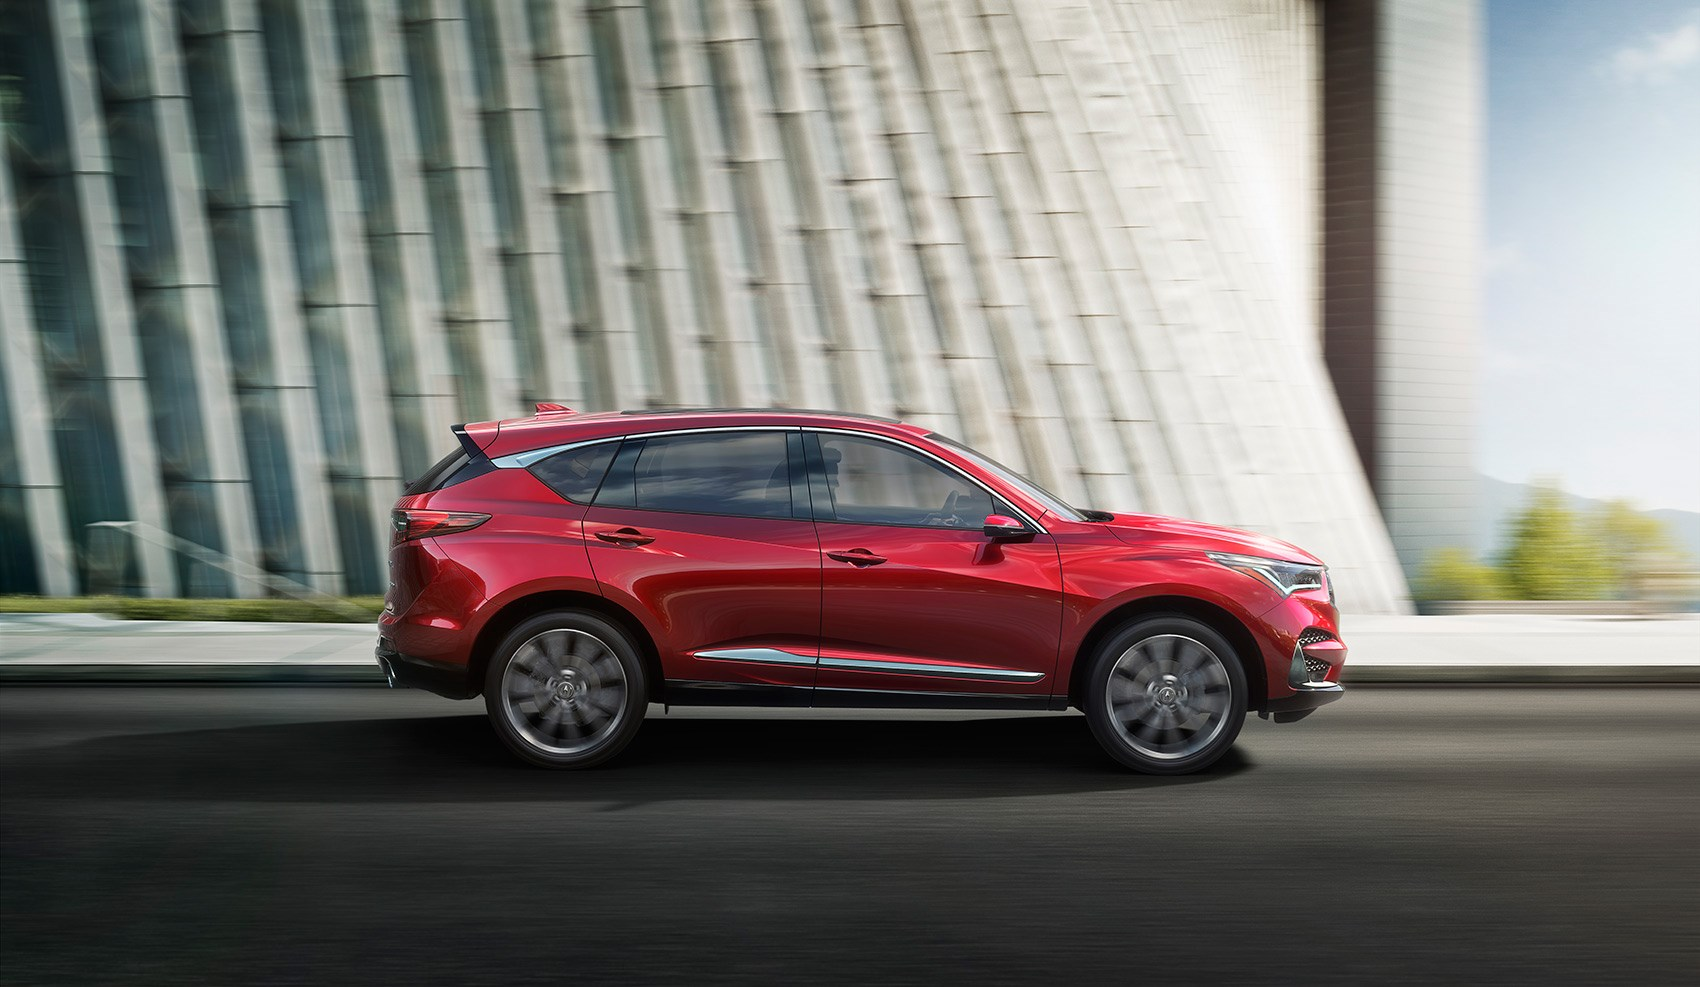 Acura RDX Prototype at 2018 Detroit motor show by CAR Magazine